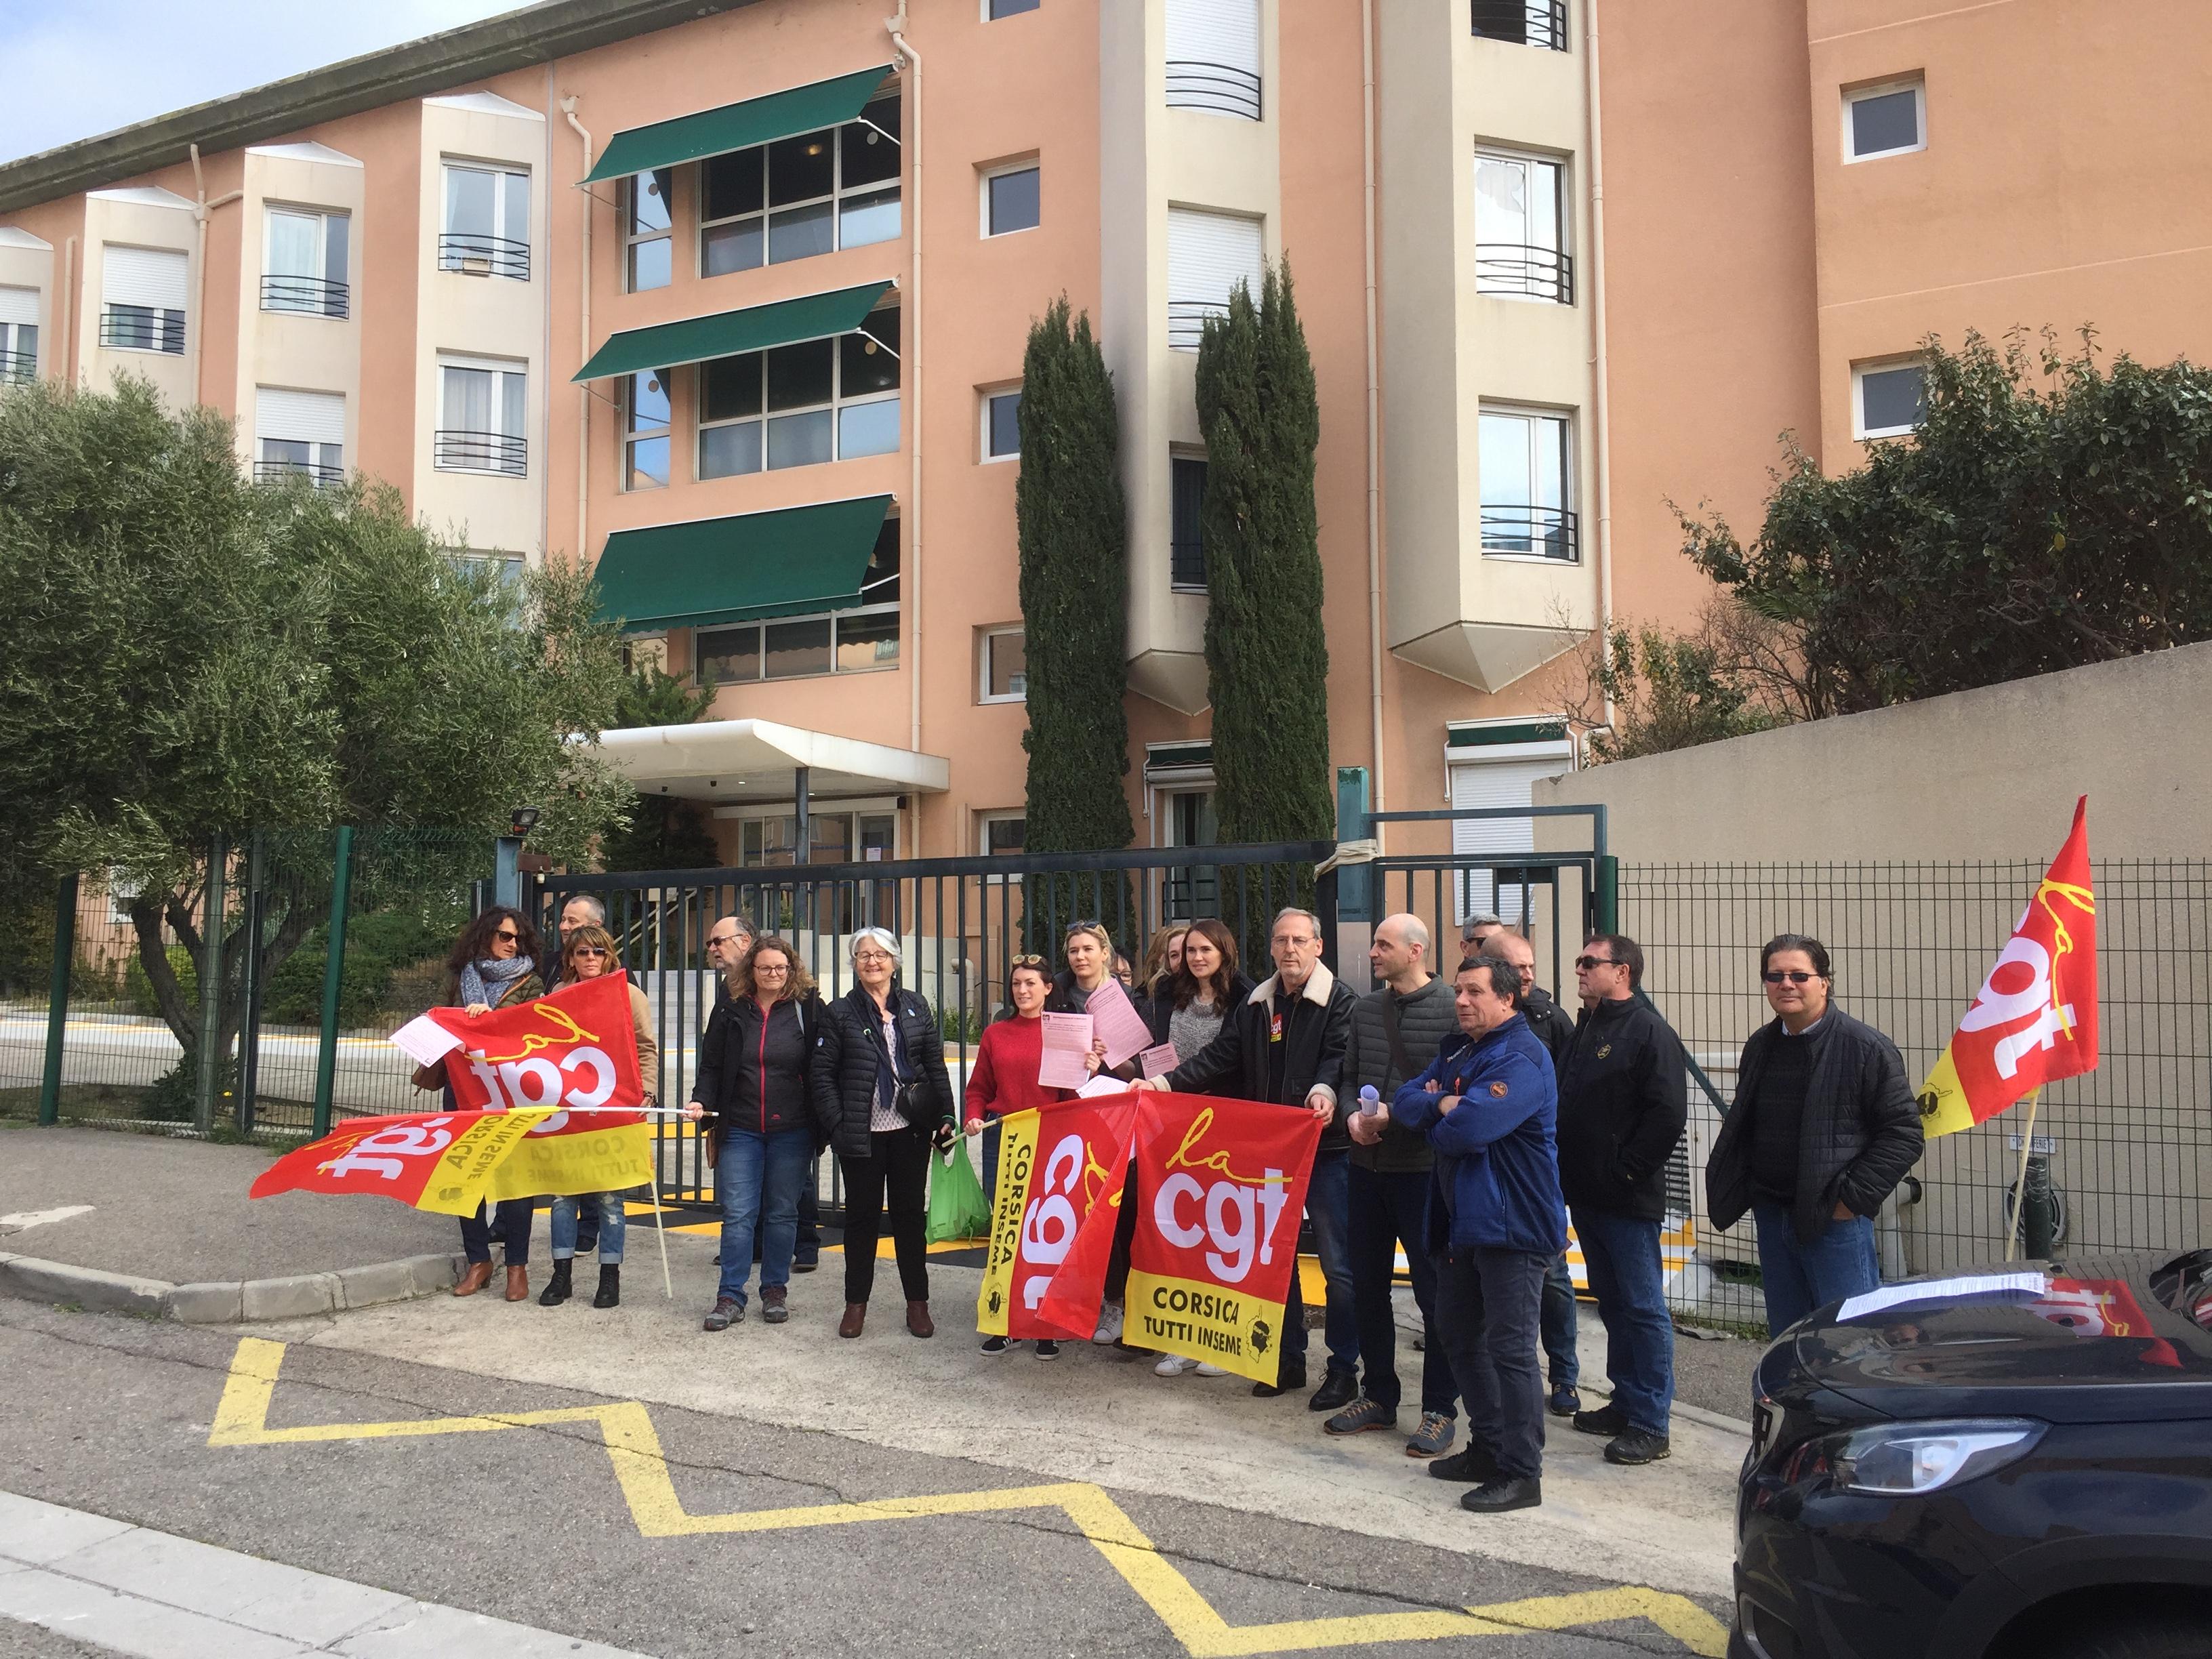 EHPAD Bocognano à Bastia : Vives critiques de la CGT, réplique de la directrice !